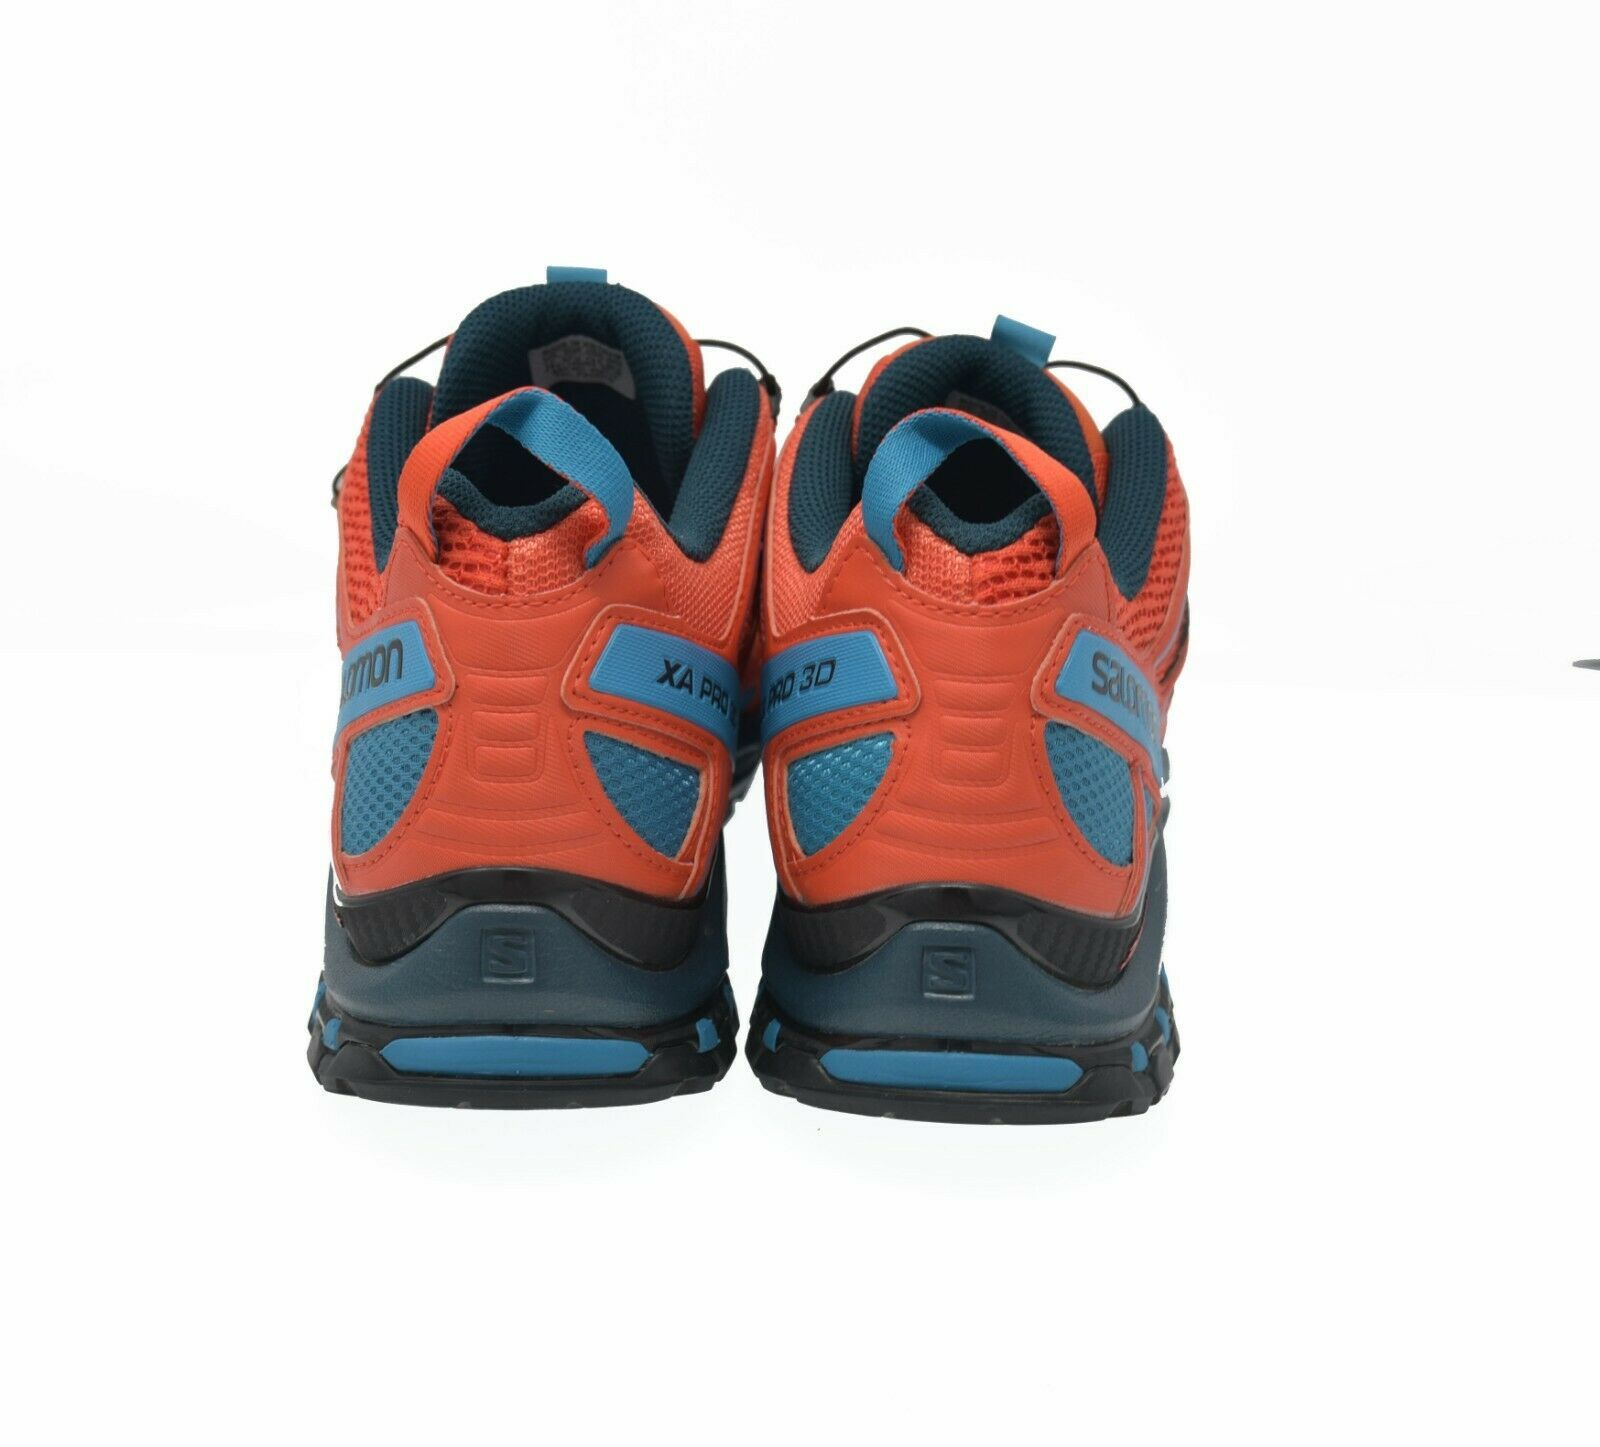 Solomon XA PRO 3D Trail Running Men's Sz 12.5 EU 47.5 Hiking Trail Sports Shoes image 2